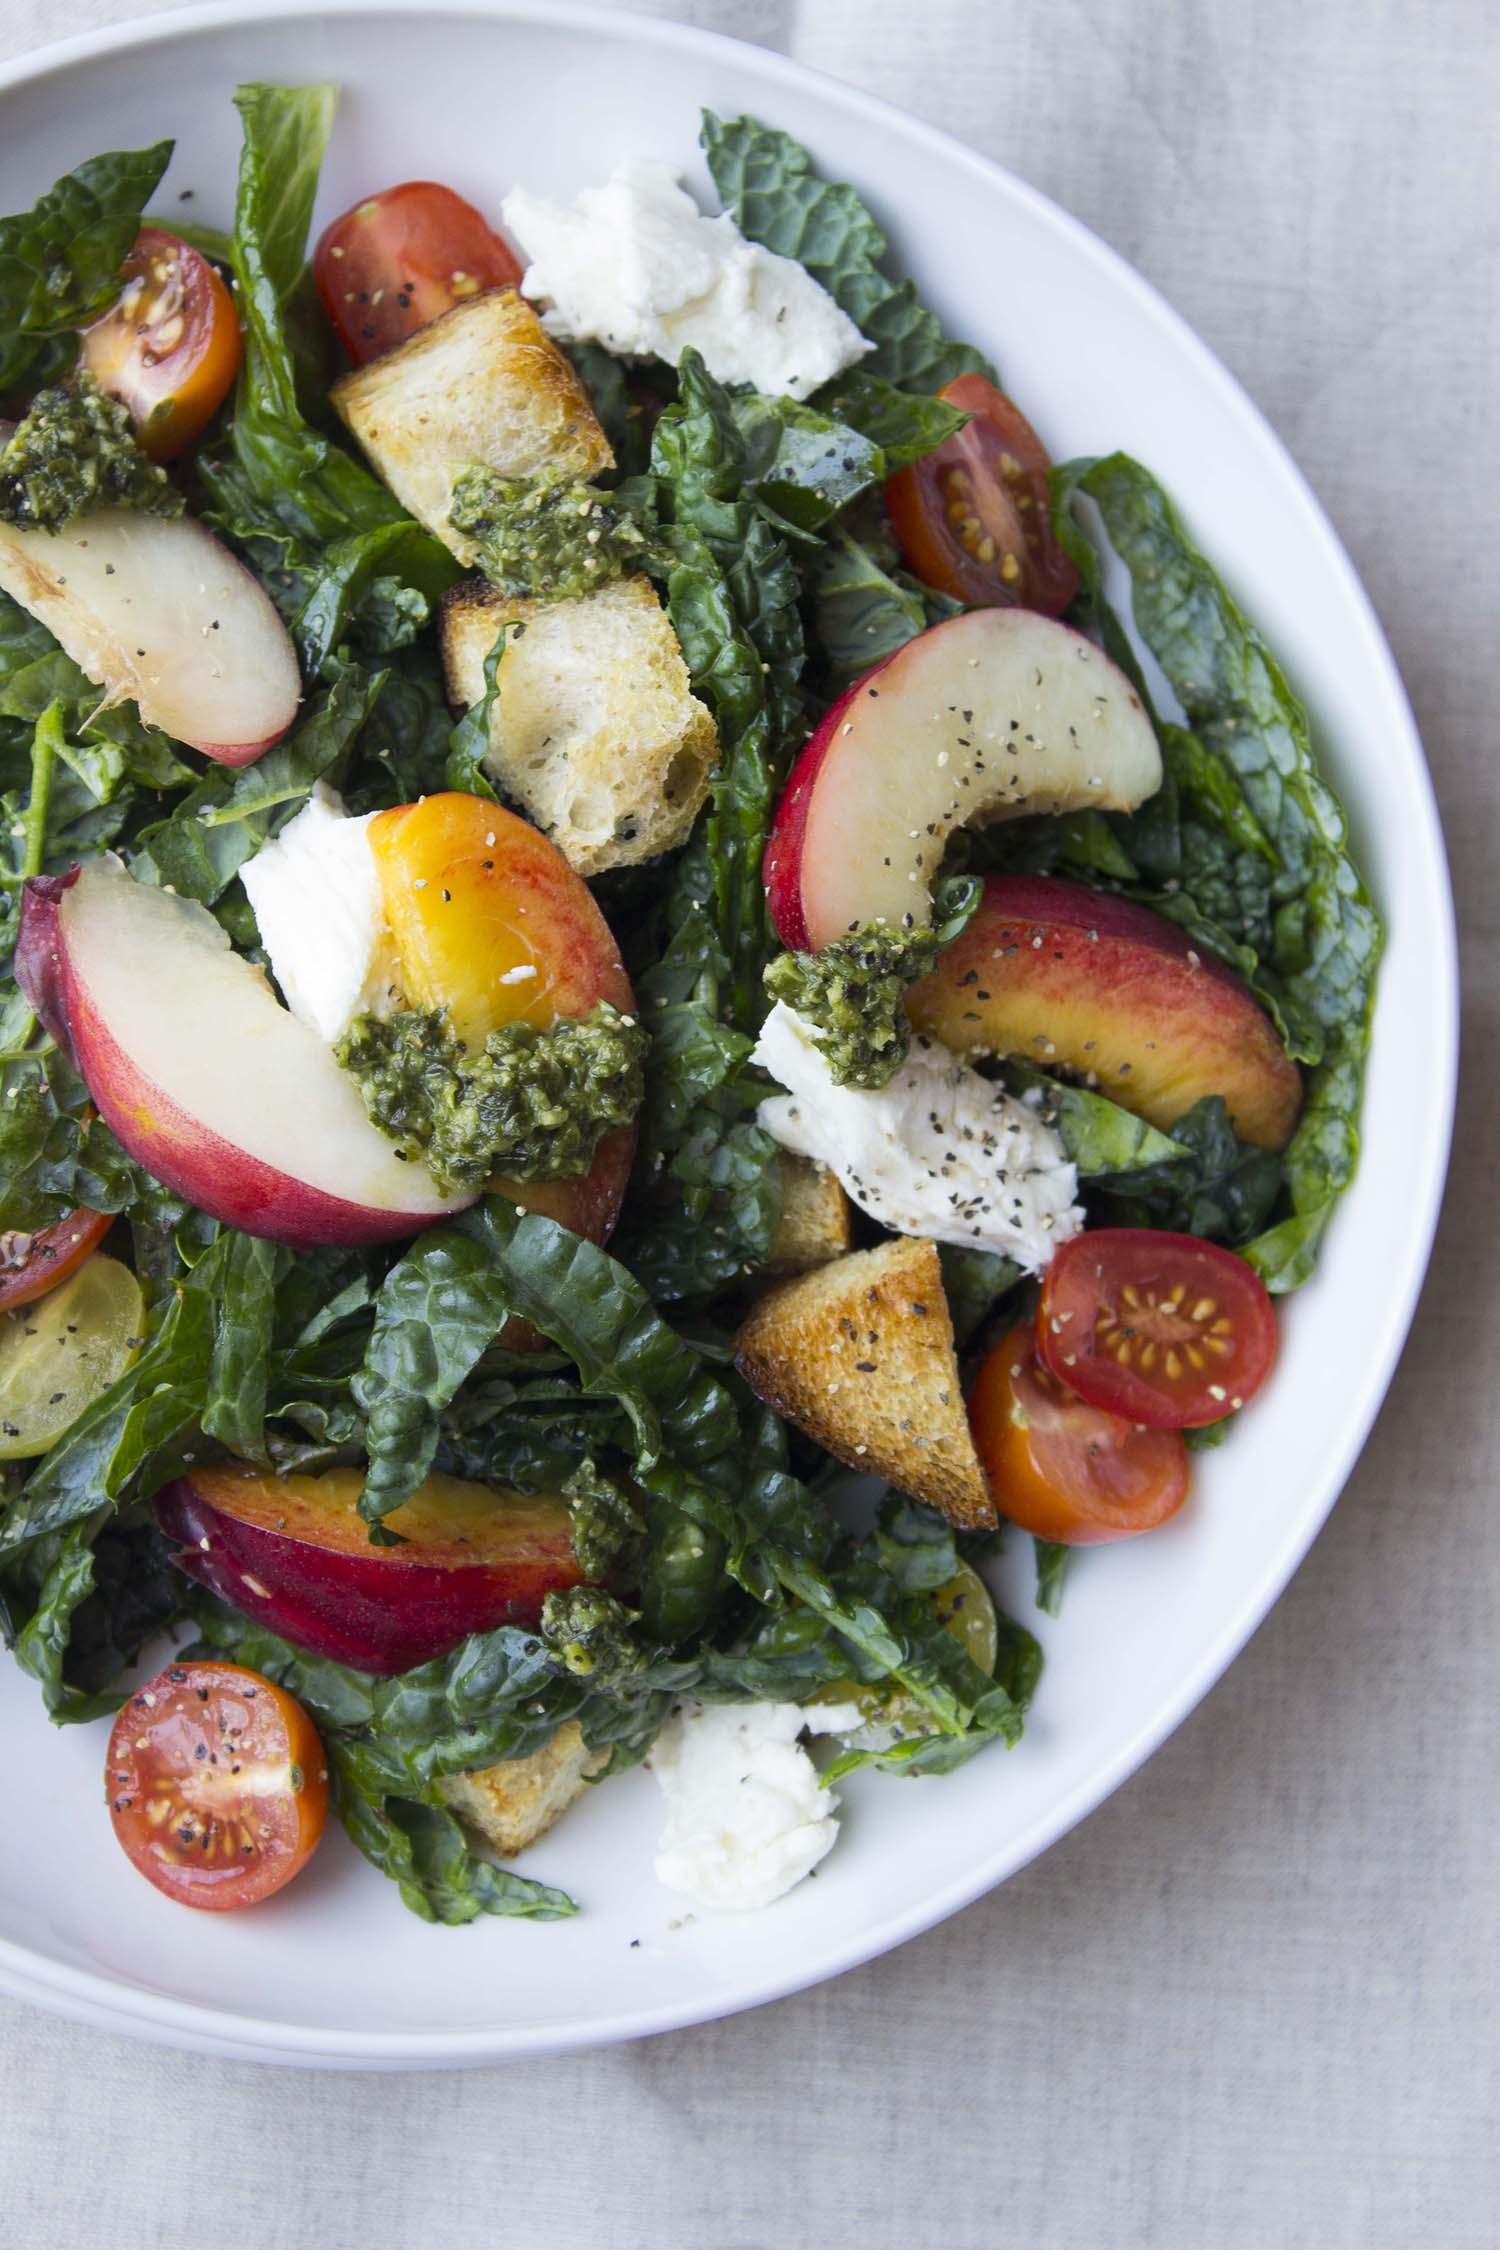 Summer Panzanella Salad with Pesto Vinaigrette  | Image:  Laura Messersmith